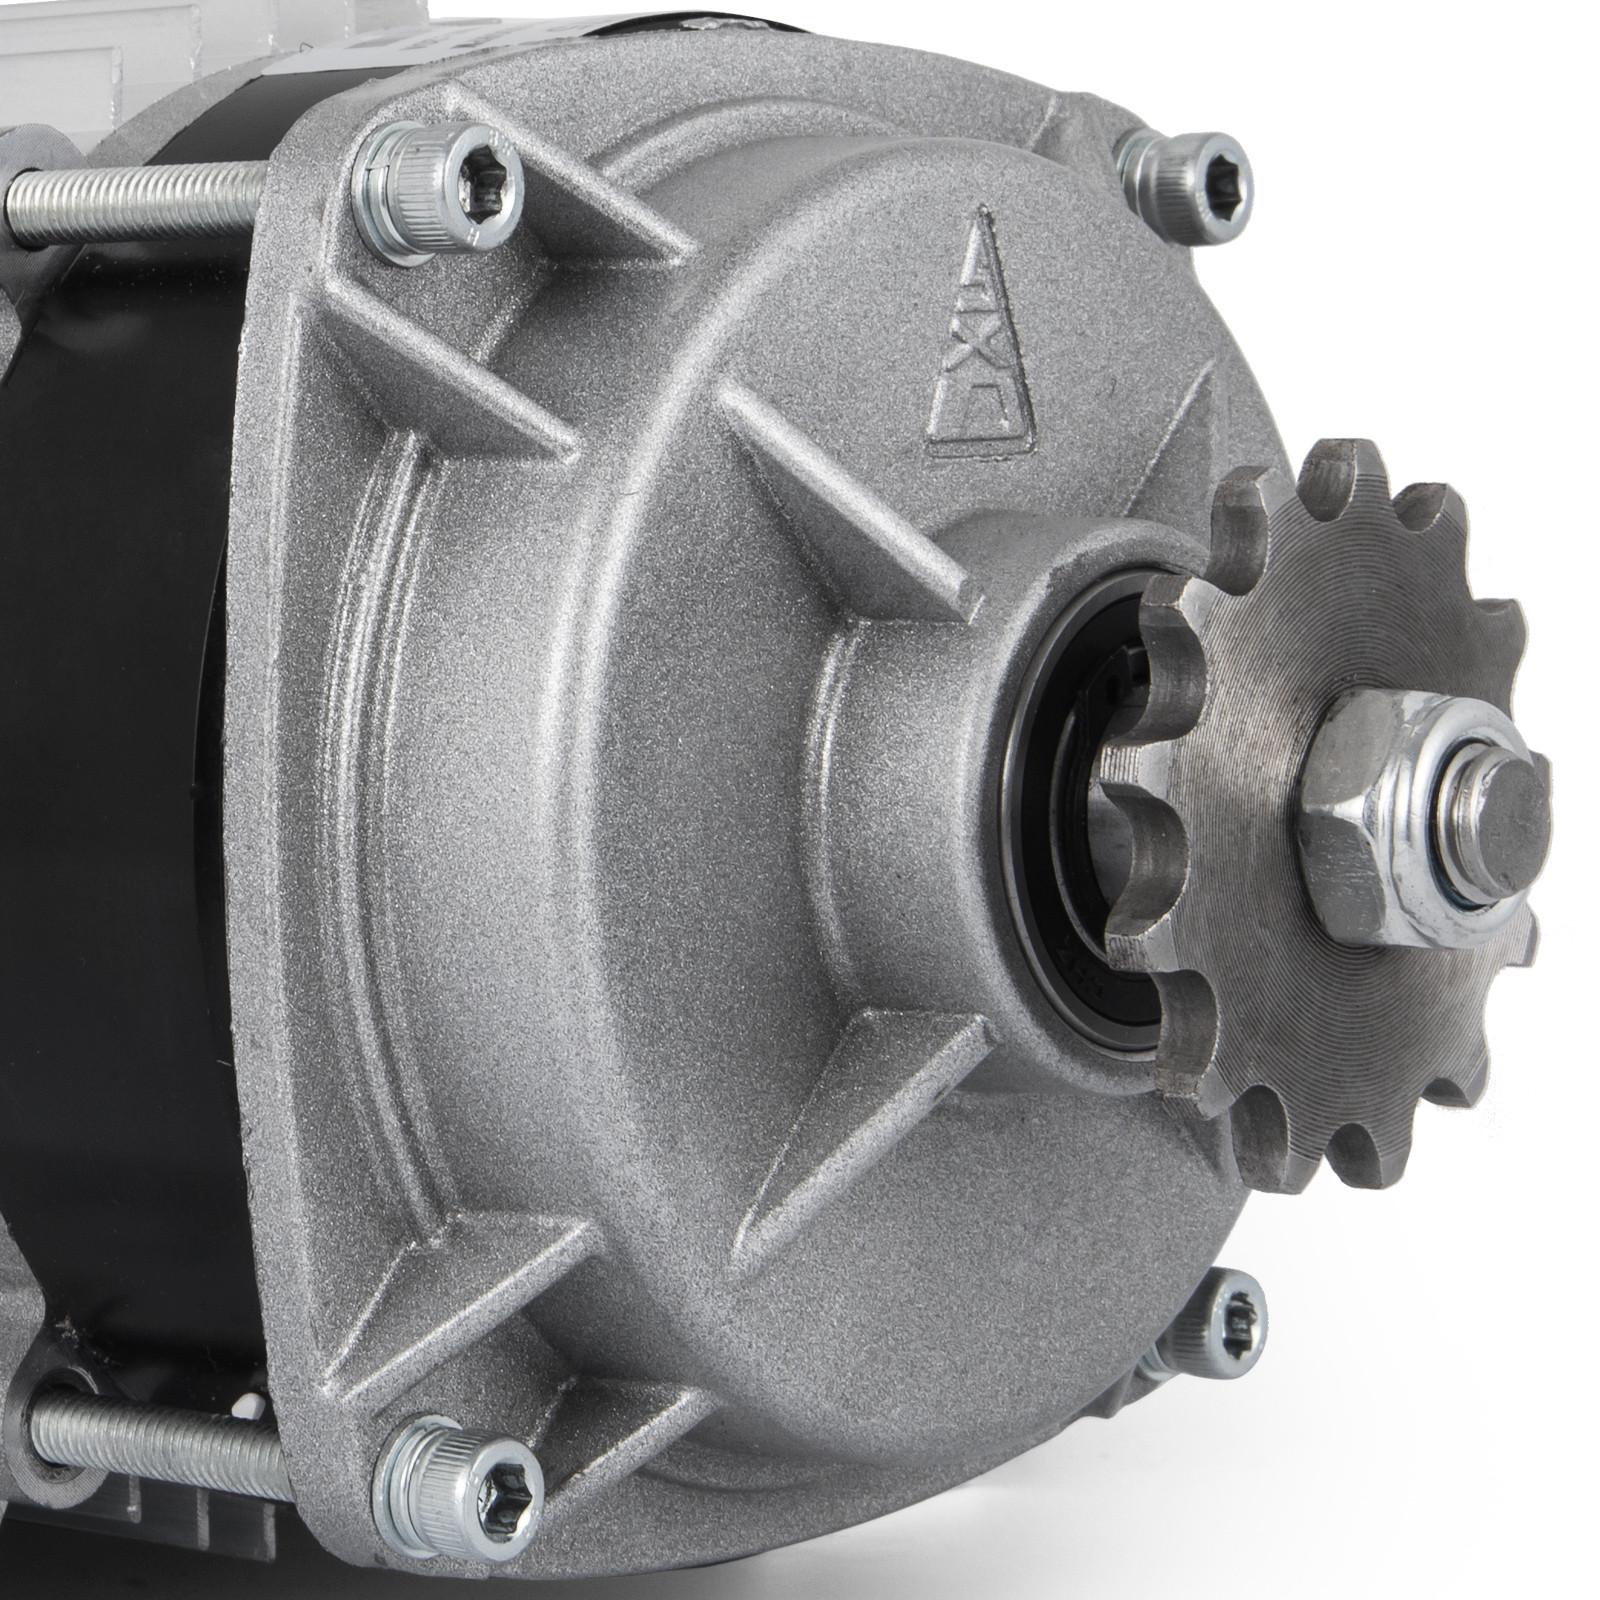 1800W-48V-DC-Brushless-Electric-Motor-Kit-f-Scooter-500-1800W-E-Bike-Go-Kart thumbnail 152